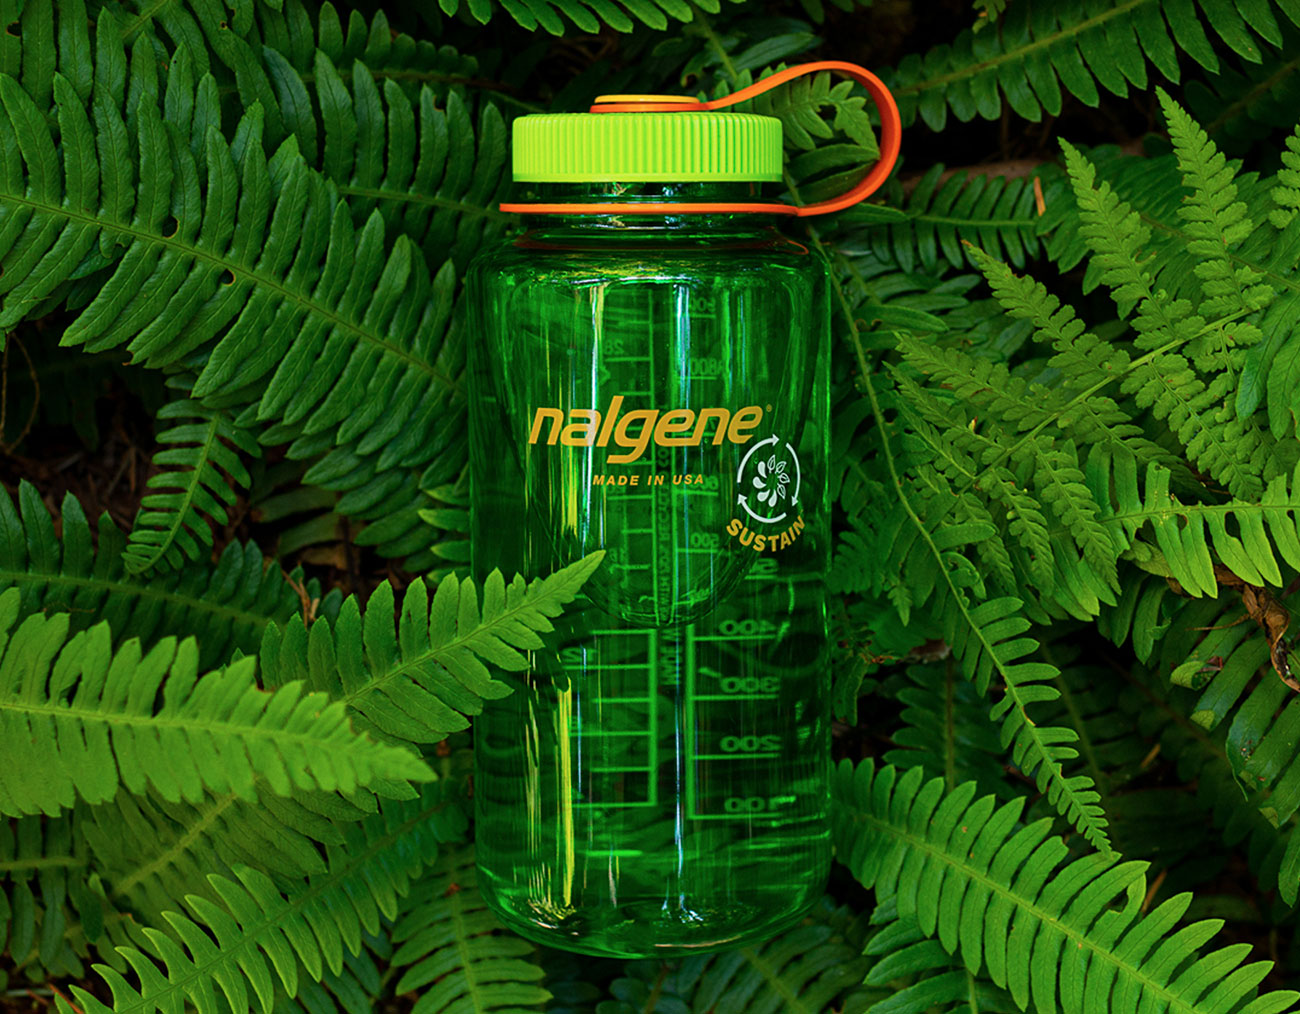 Nalgene 32 oz Sustain Water Bottle